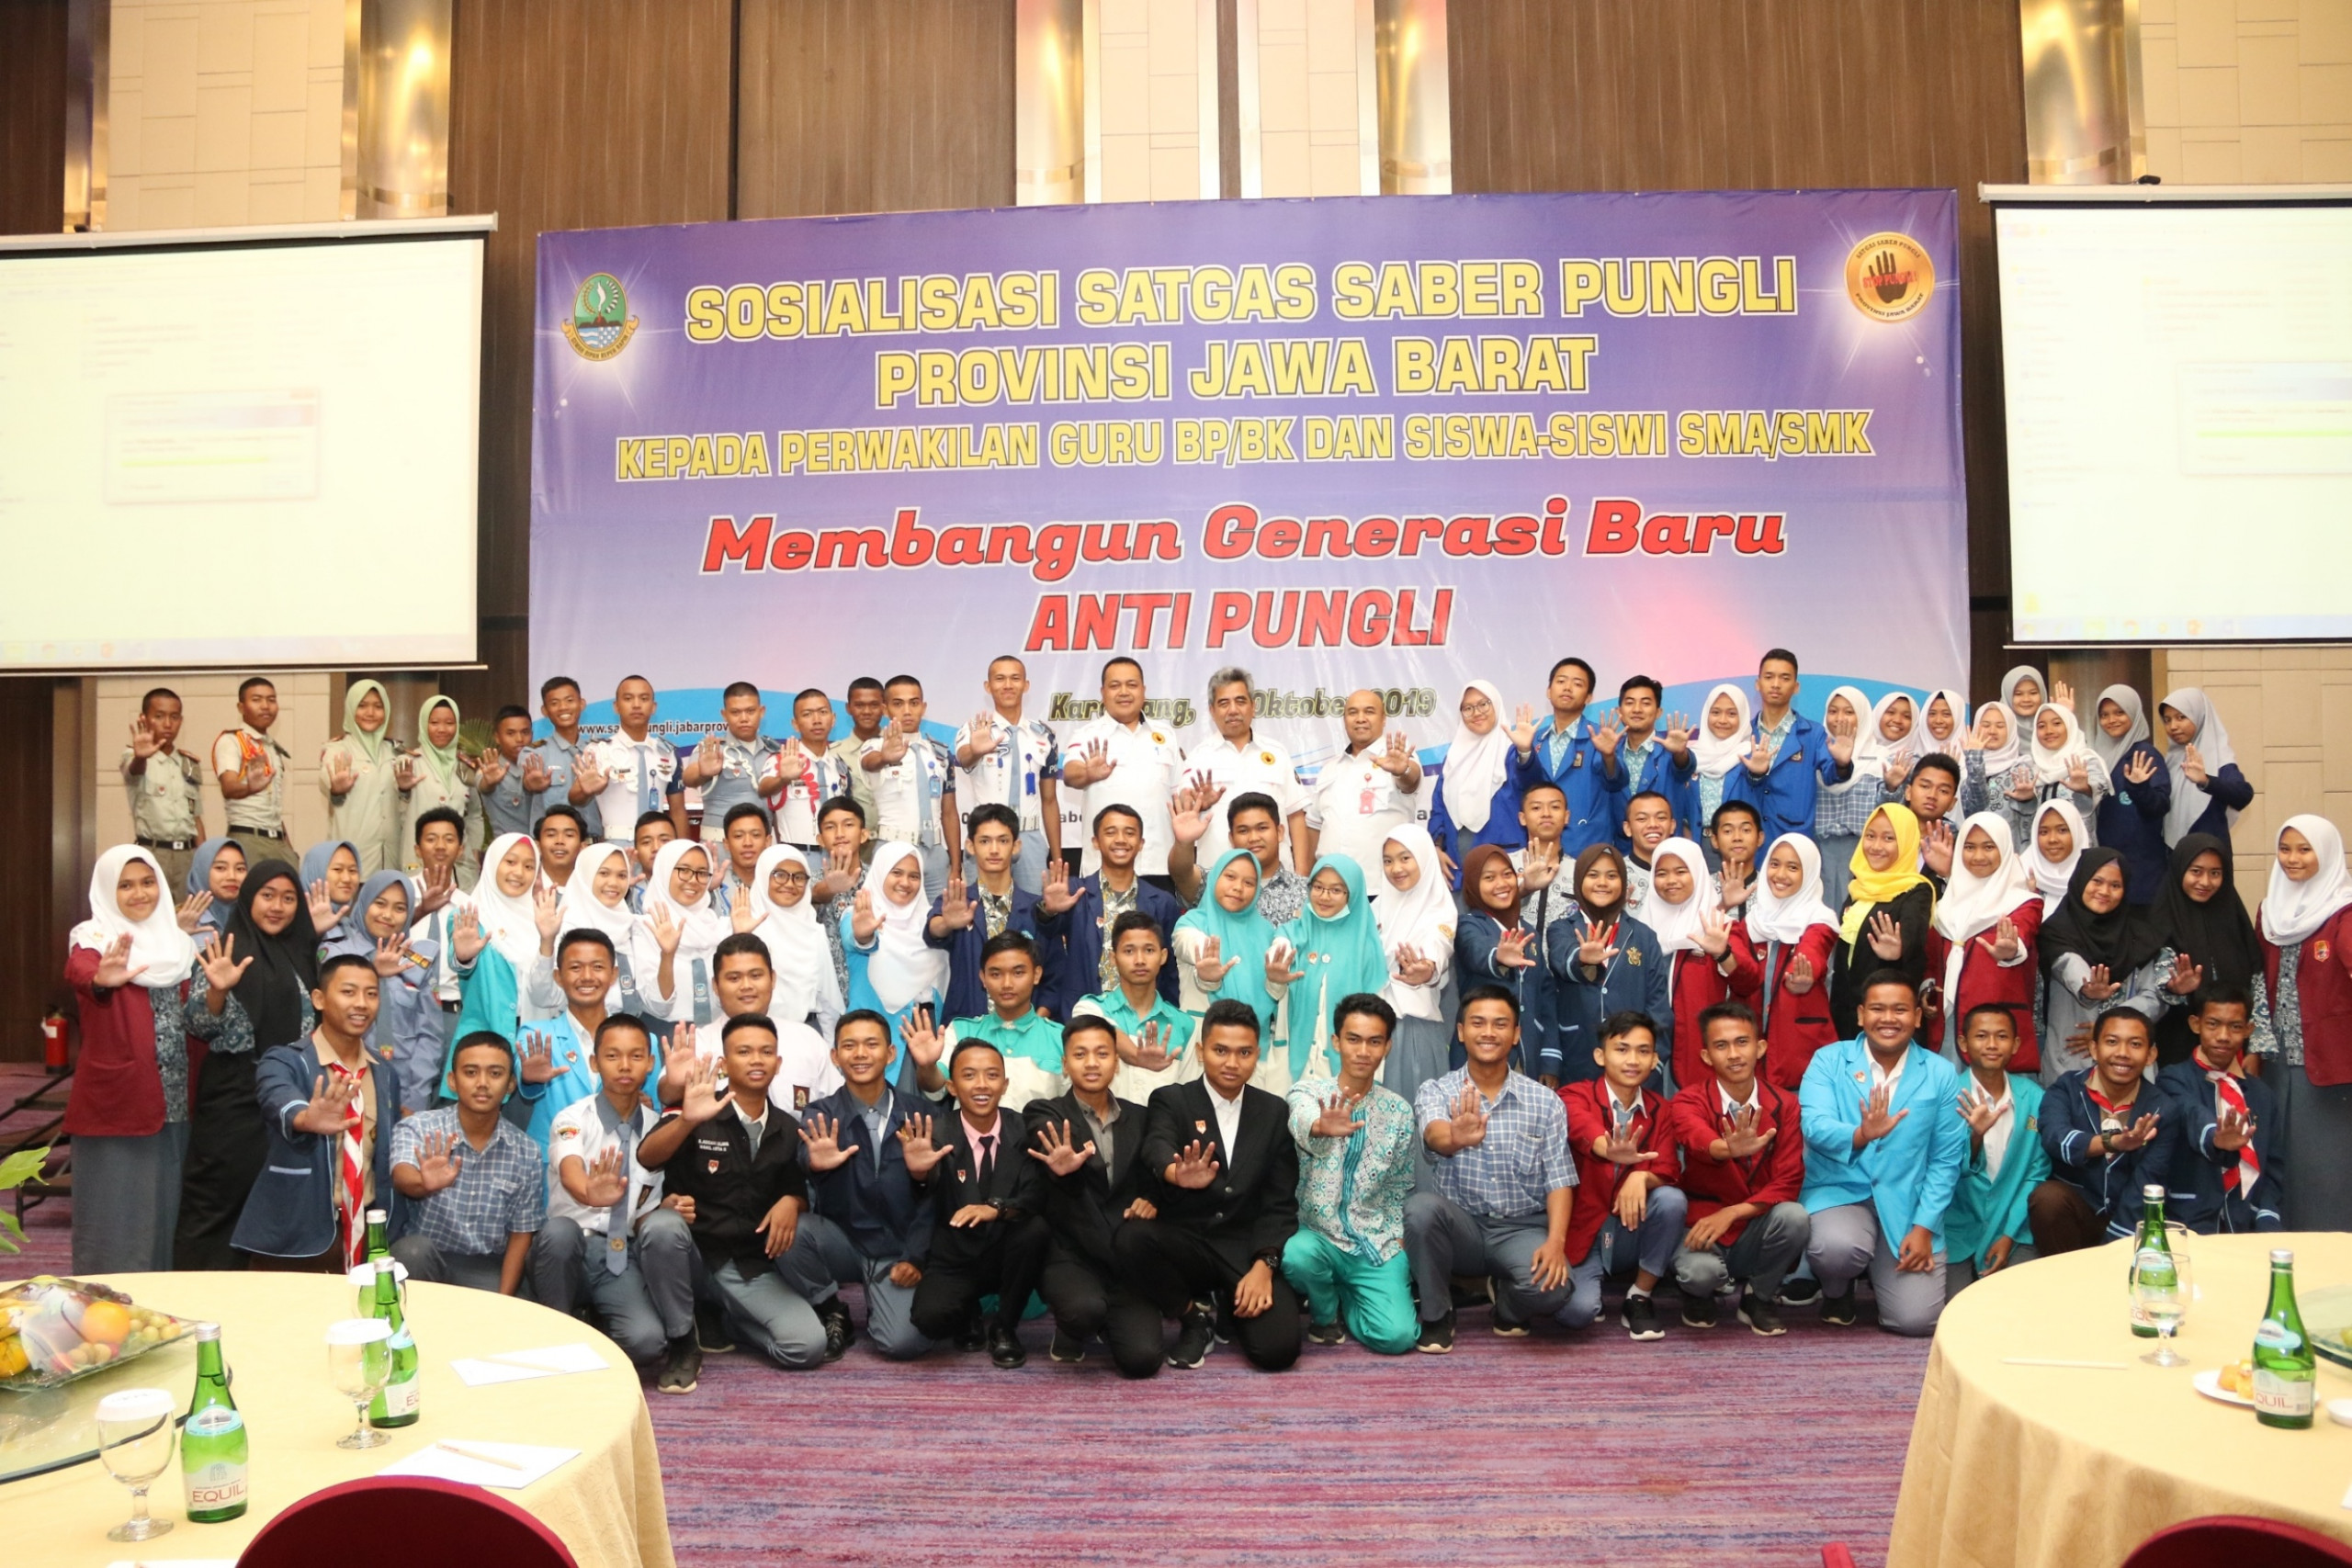 saberpungli jabar - Satgas Saber Pungli Jabar Bersinergi dengan Guru dan Siswa SMA/SMK